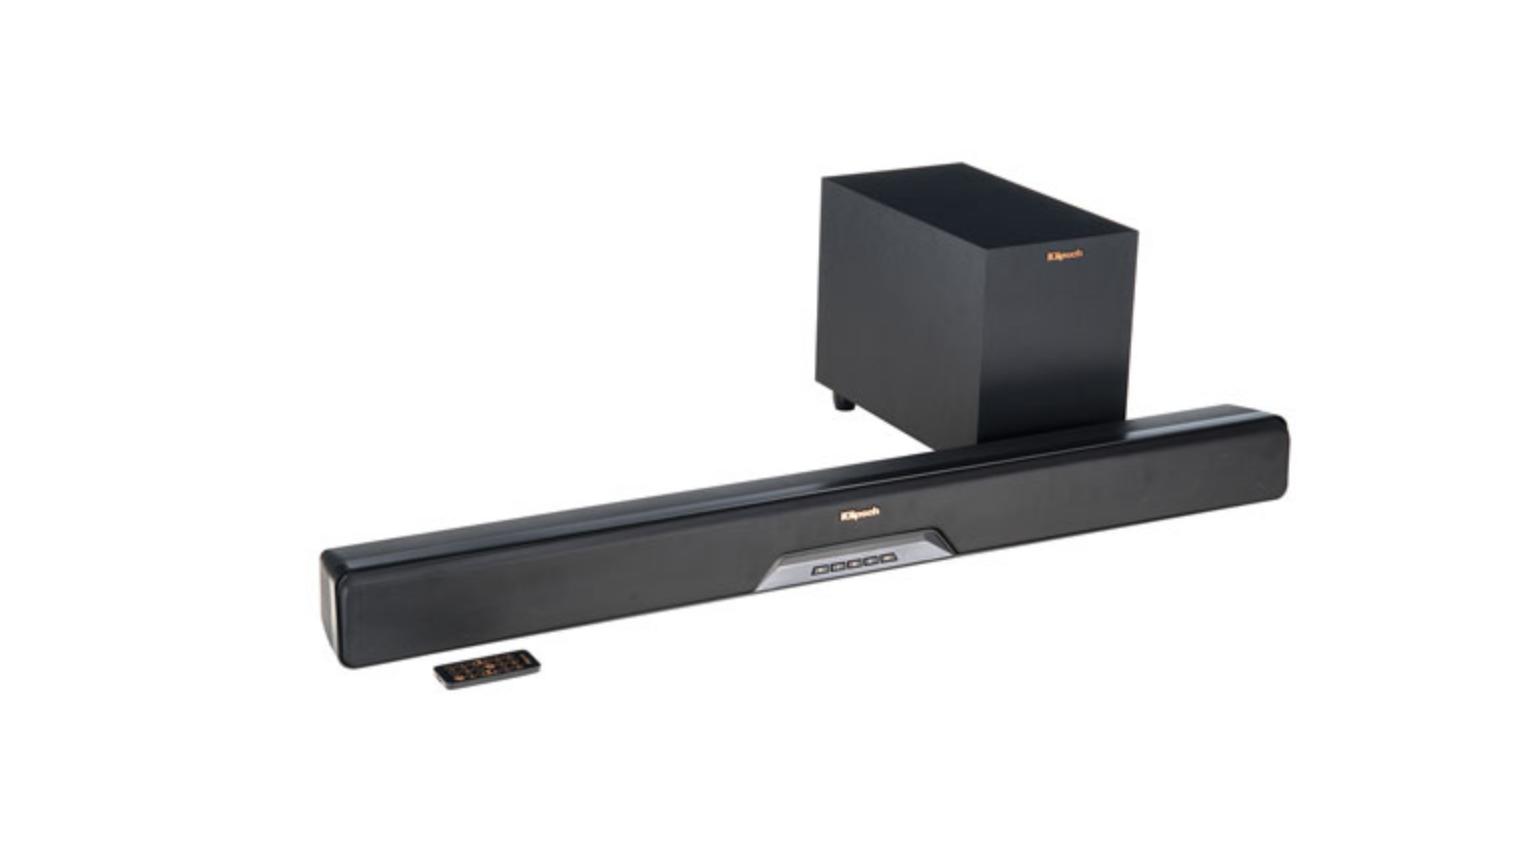 klipsch rsb 6 sound bar